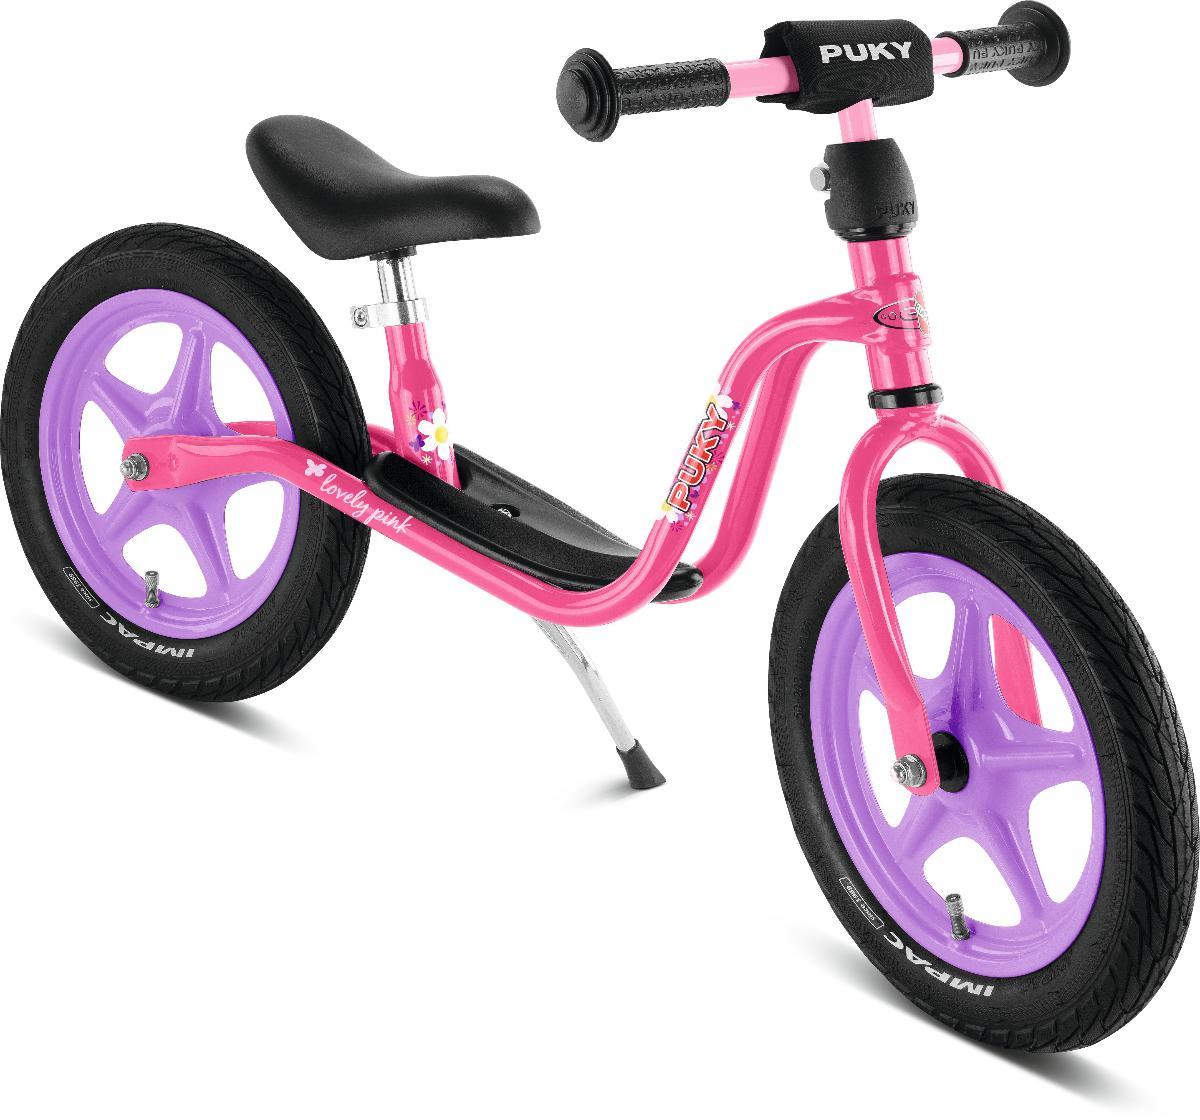 Купить Беговел PUKY 2017 LR 1L AIR pink, Беговелы, 1326584